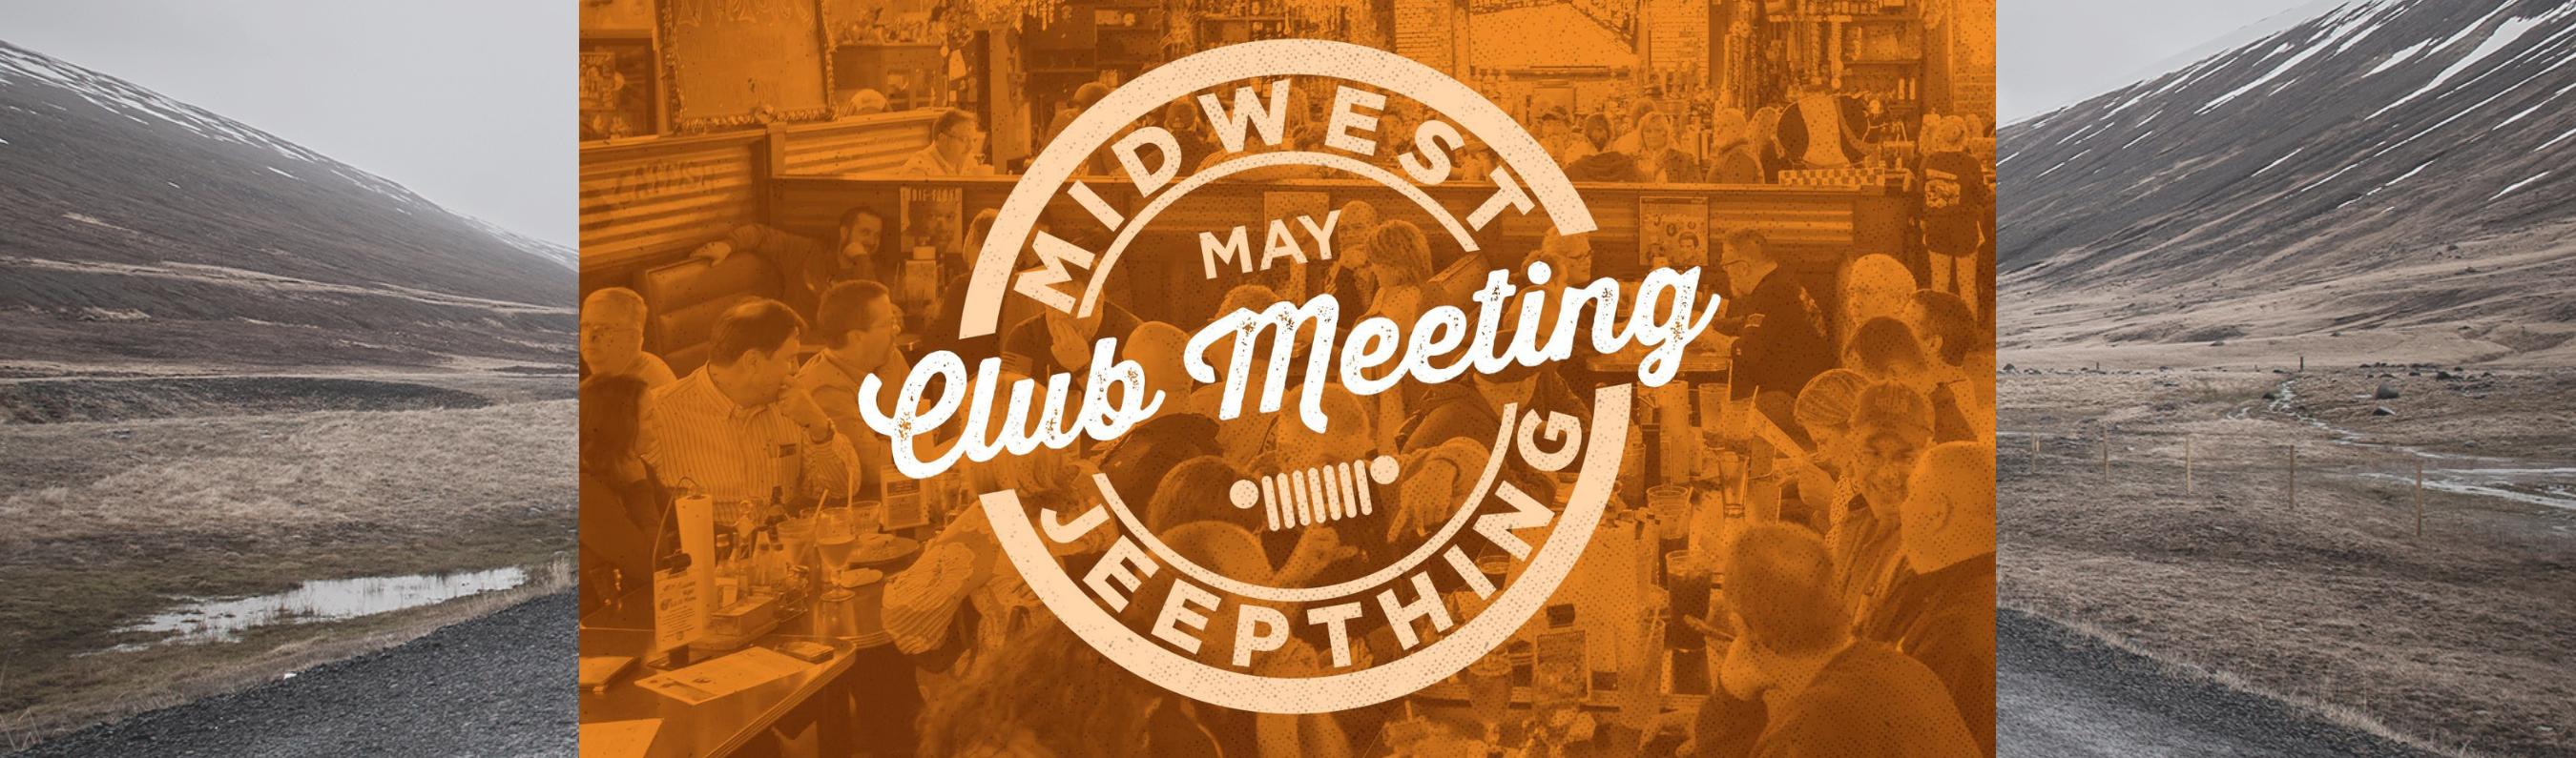 May Club Meeting